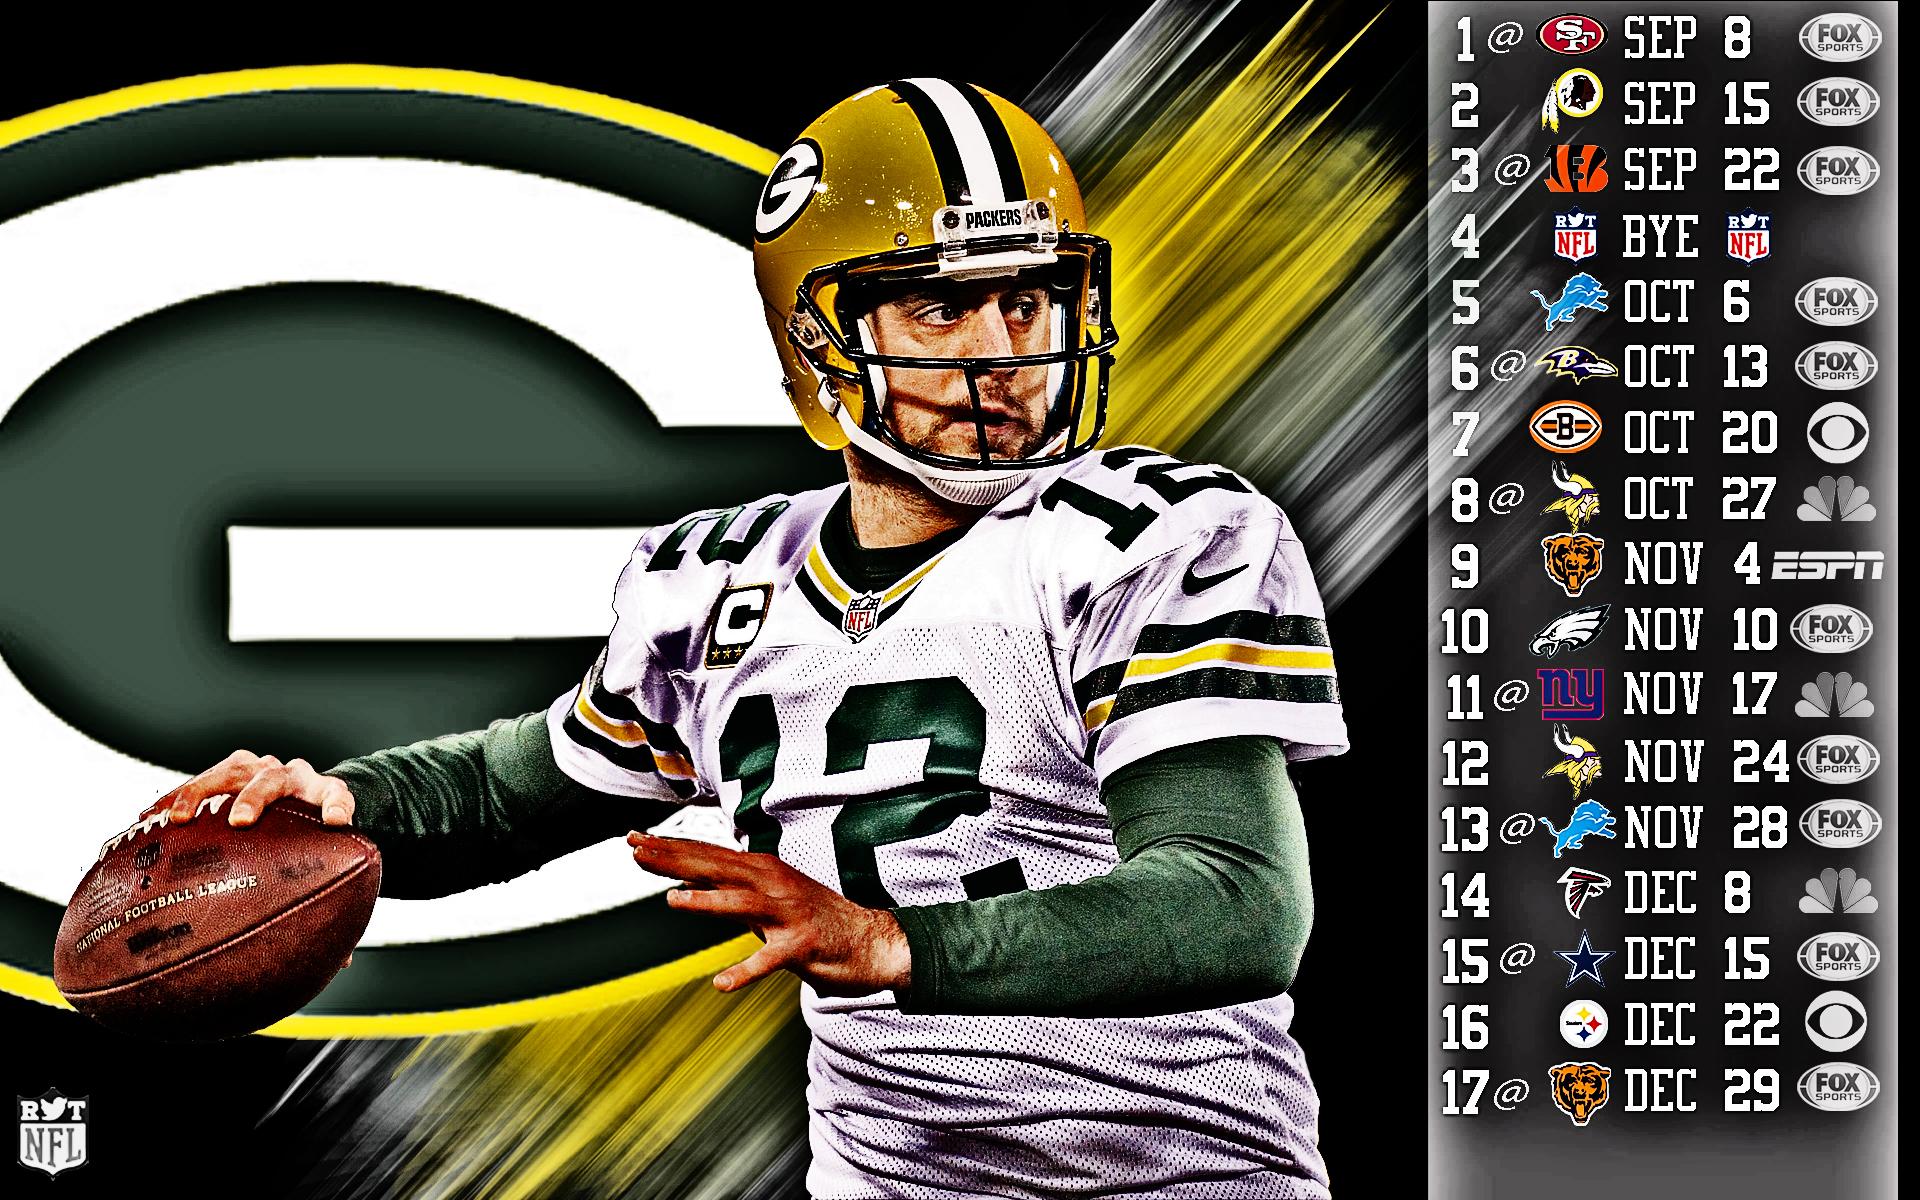 Aaron Rodgers Iphone Wallpaper Aaron Rodgers 2013 Packers Schedule Wallpaper Hdr Sports